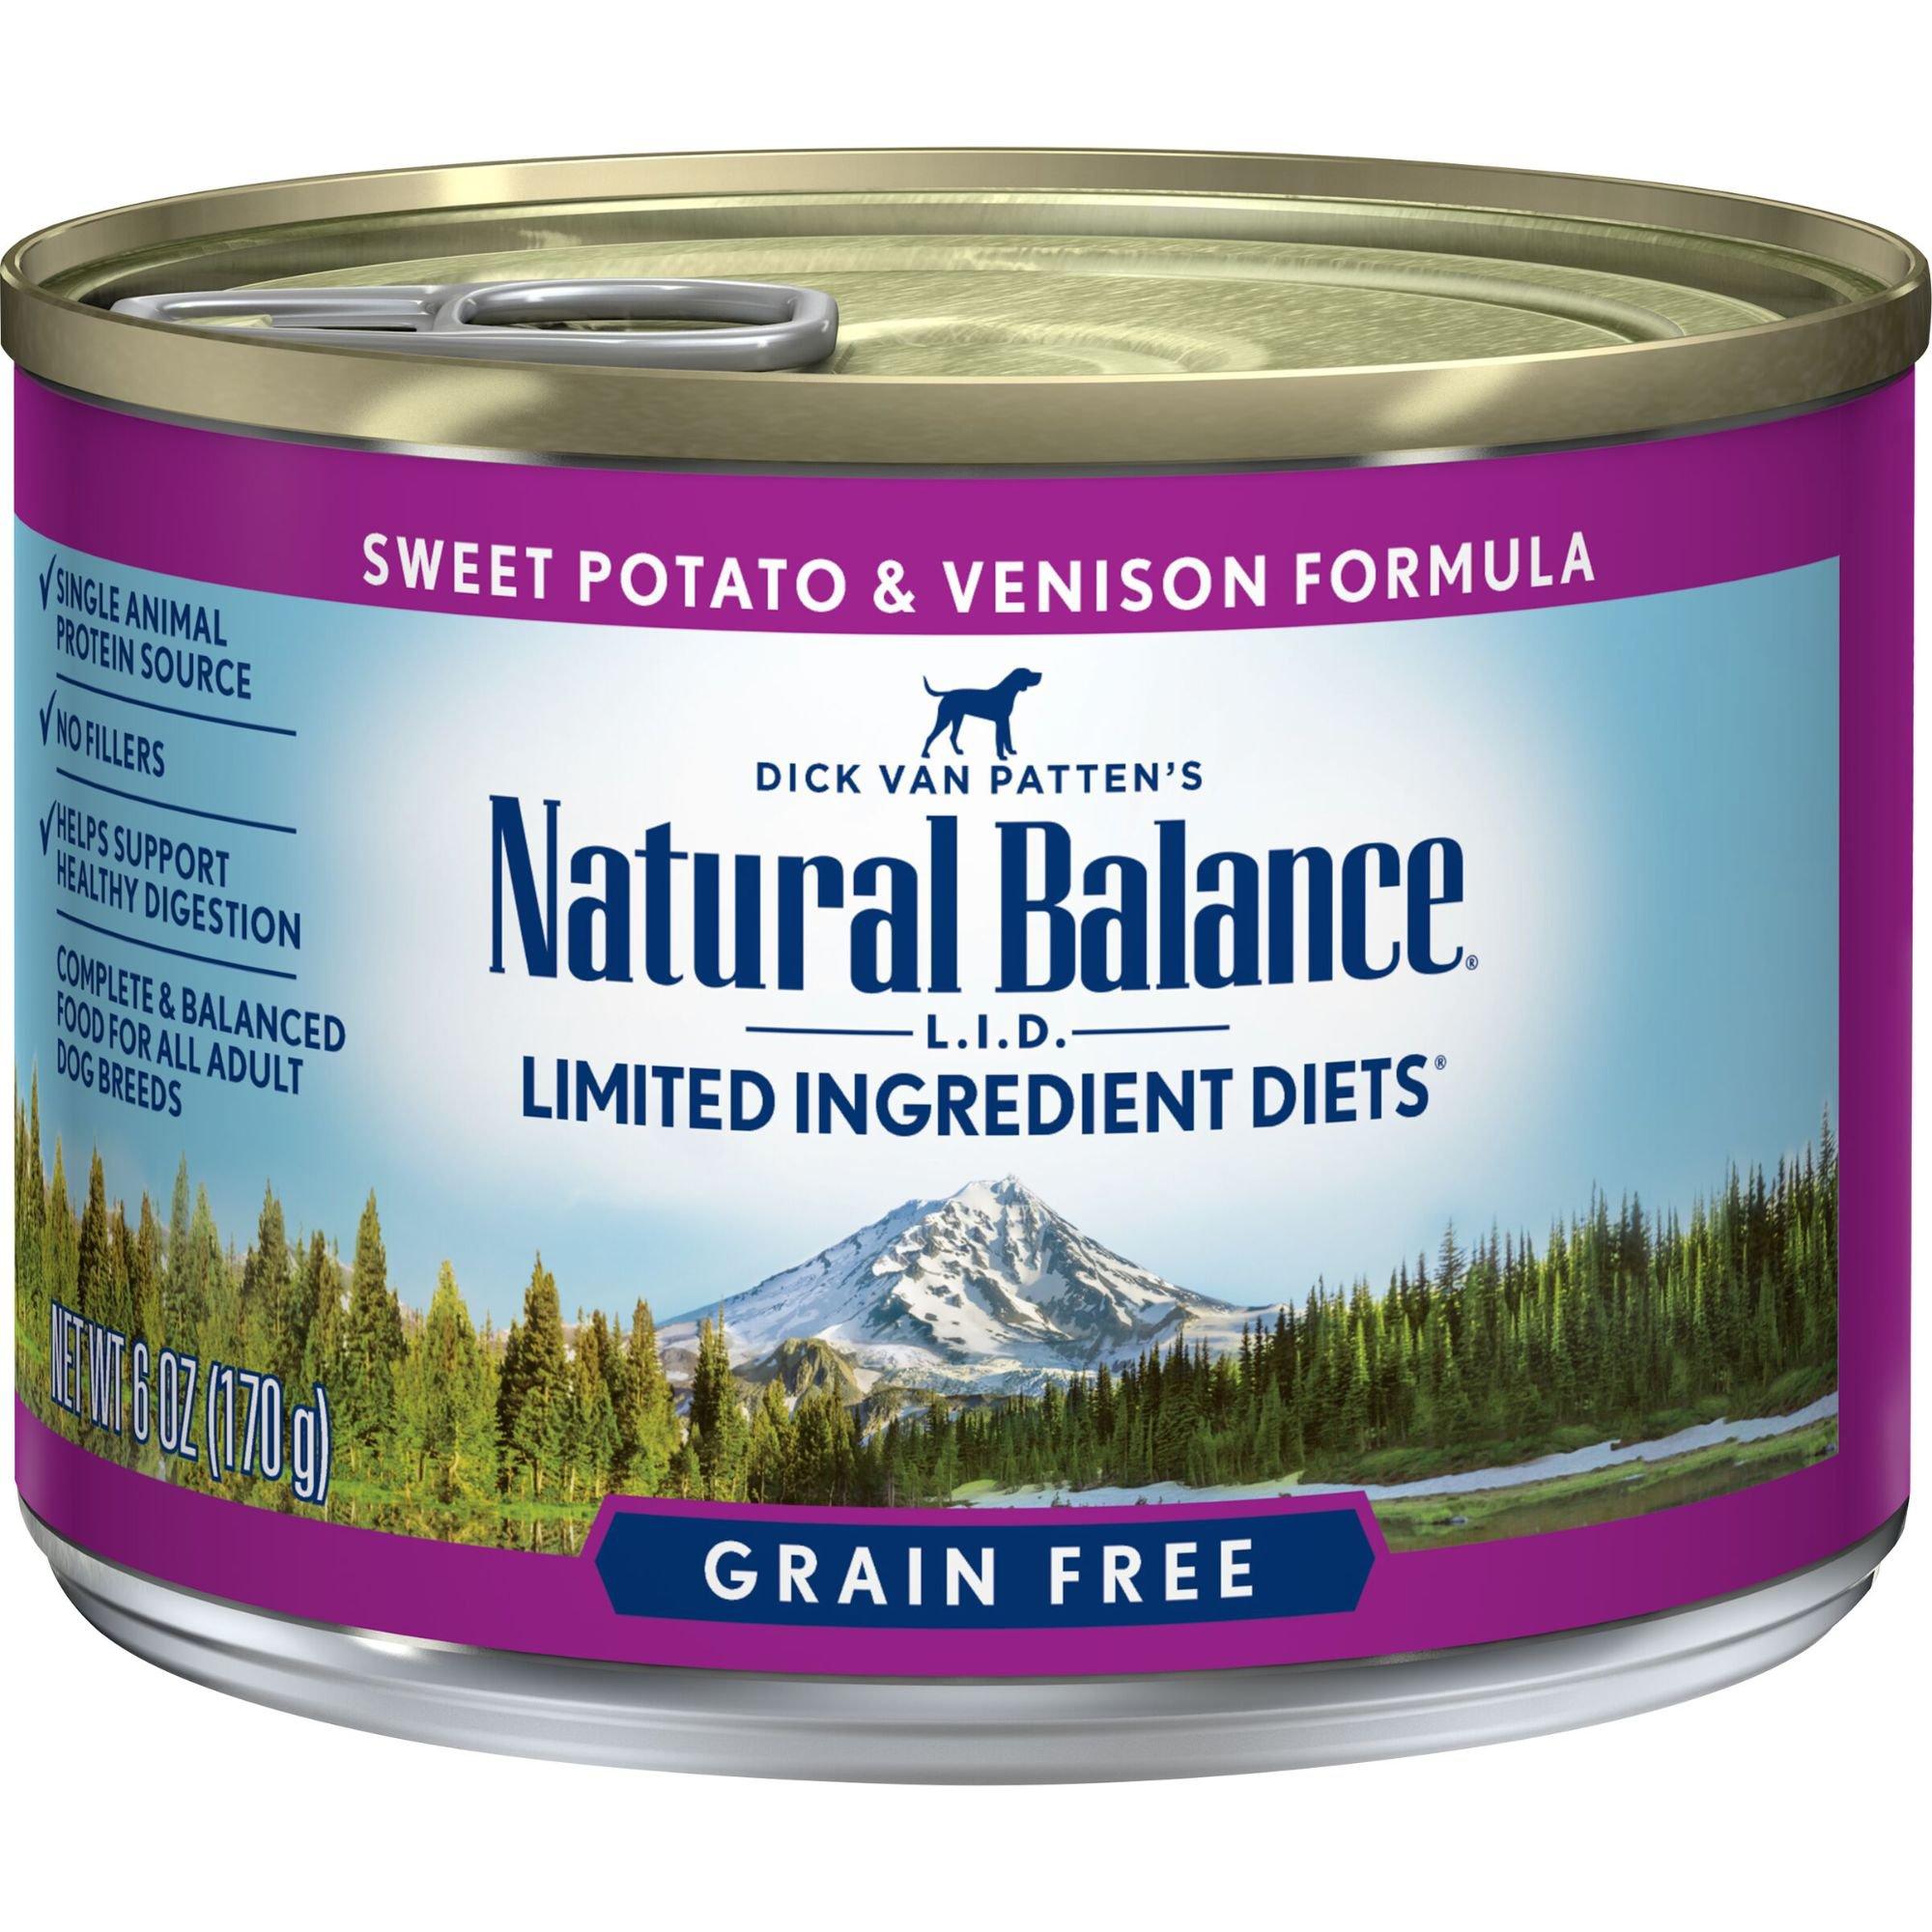 Natural Balance Limited Ingredient Diets Venison & Sweet Potato Formula Canned Dog Food